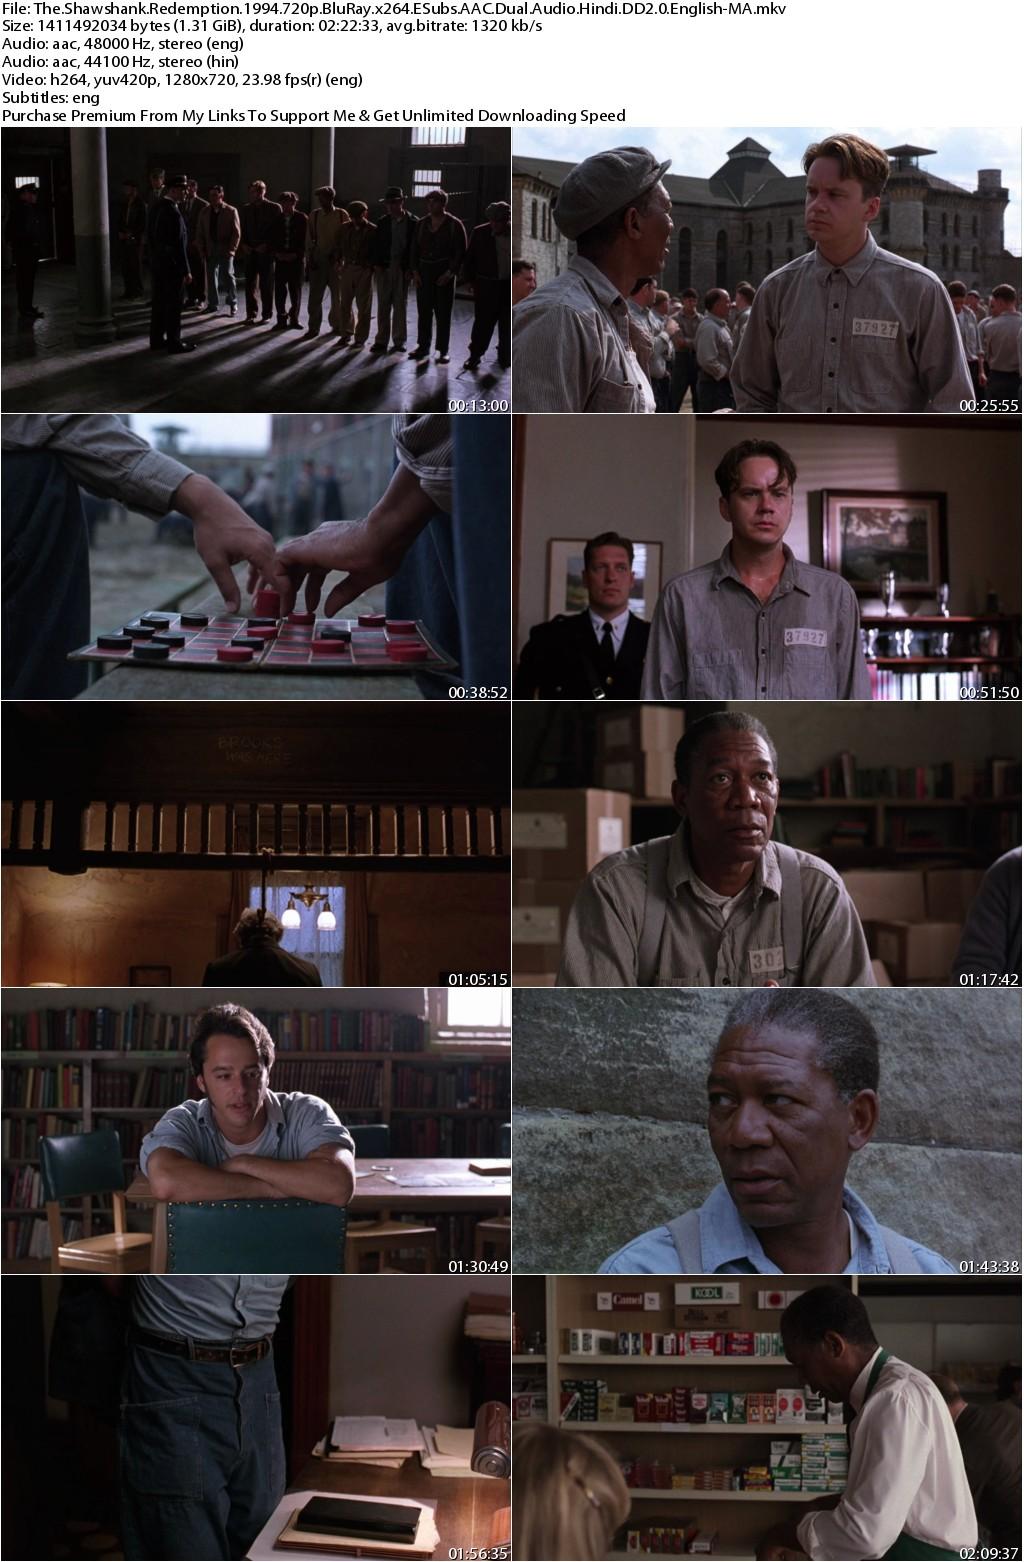 The Shawshank Redemption (1994) 720p BluRay x264 ESubs AAC Dual Audio Hindi DD2.0 English-MA